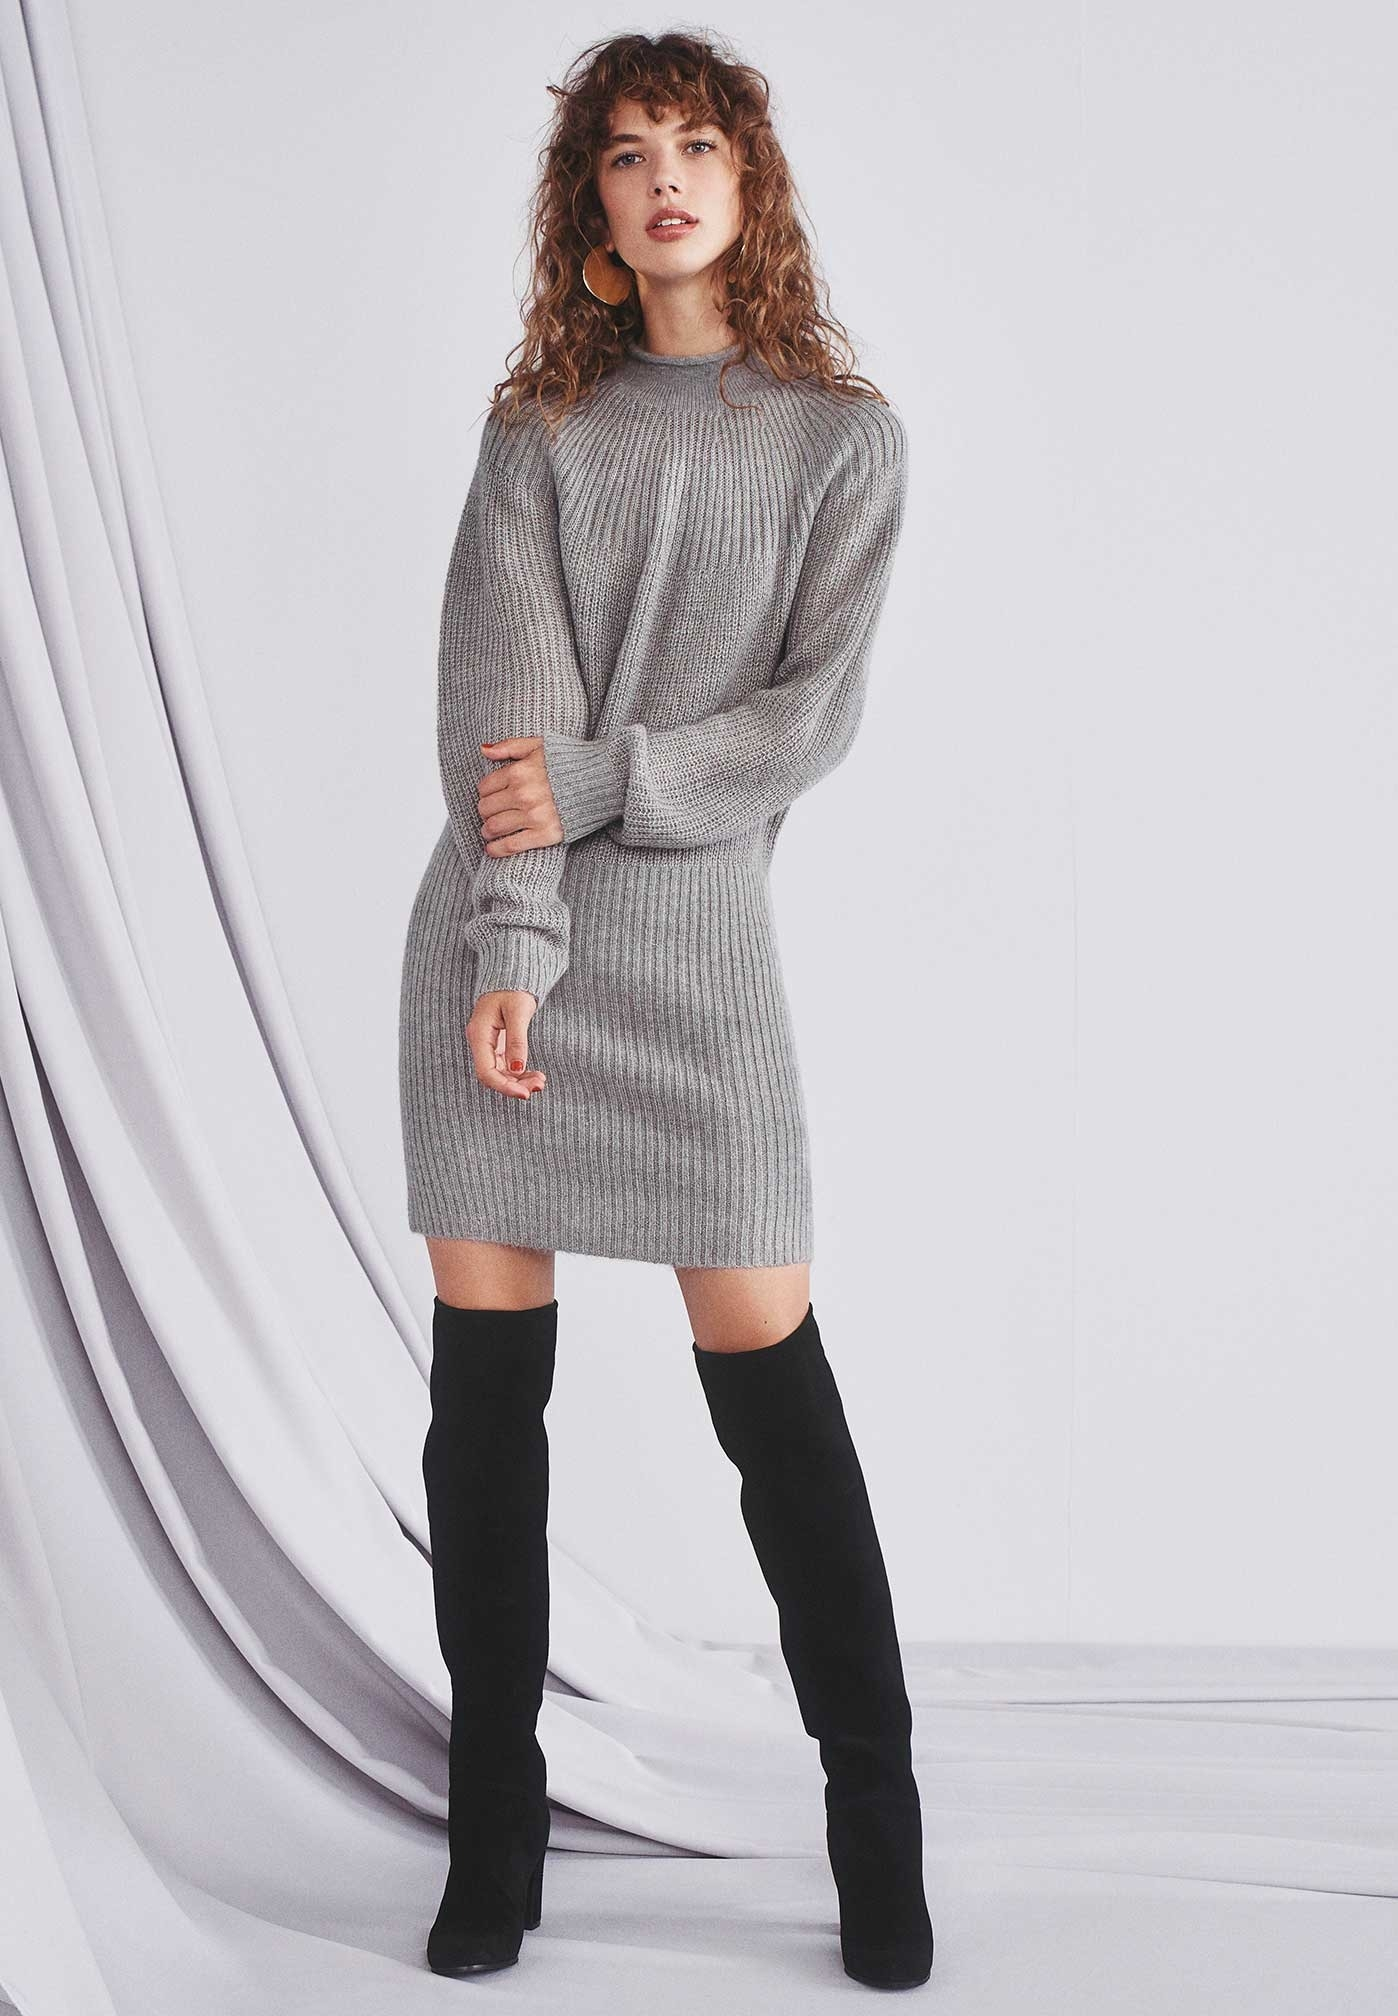 10 Genial Feminine Kleider ÄrmelDesigner Schön Feminine Kleider Ärmel